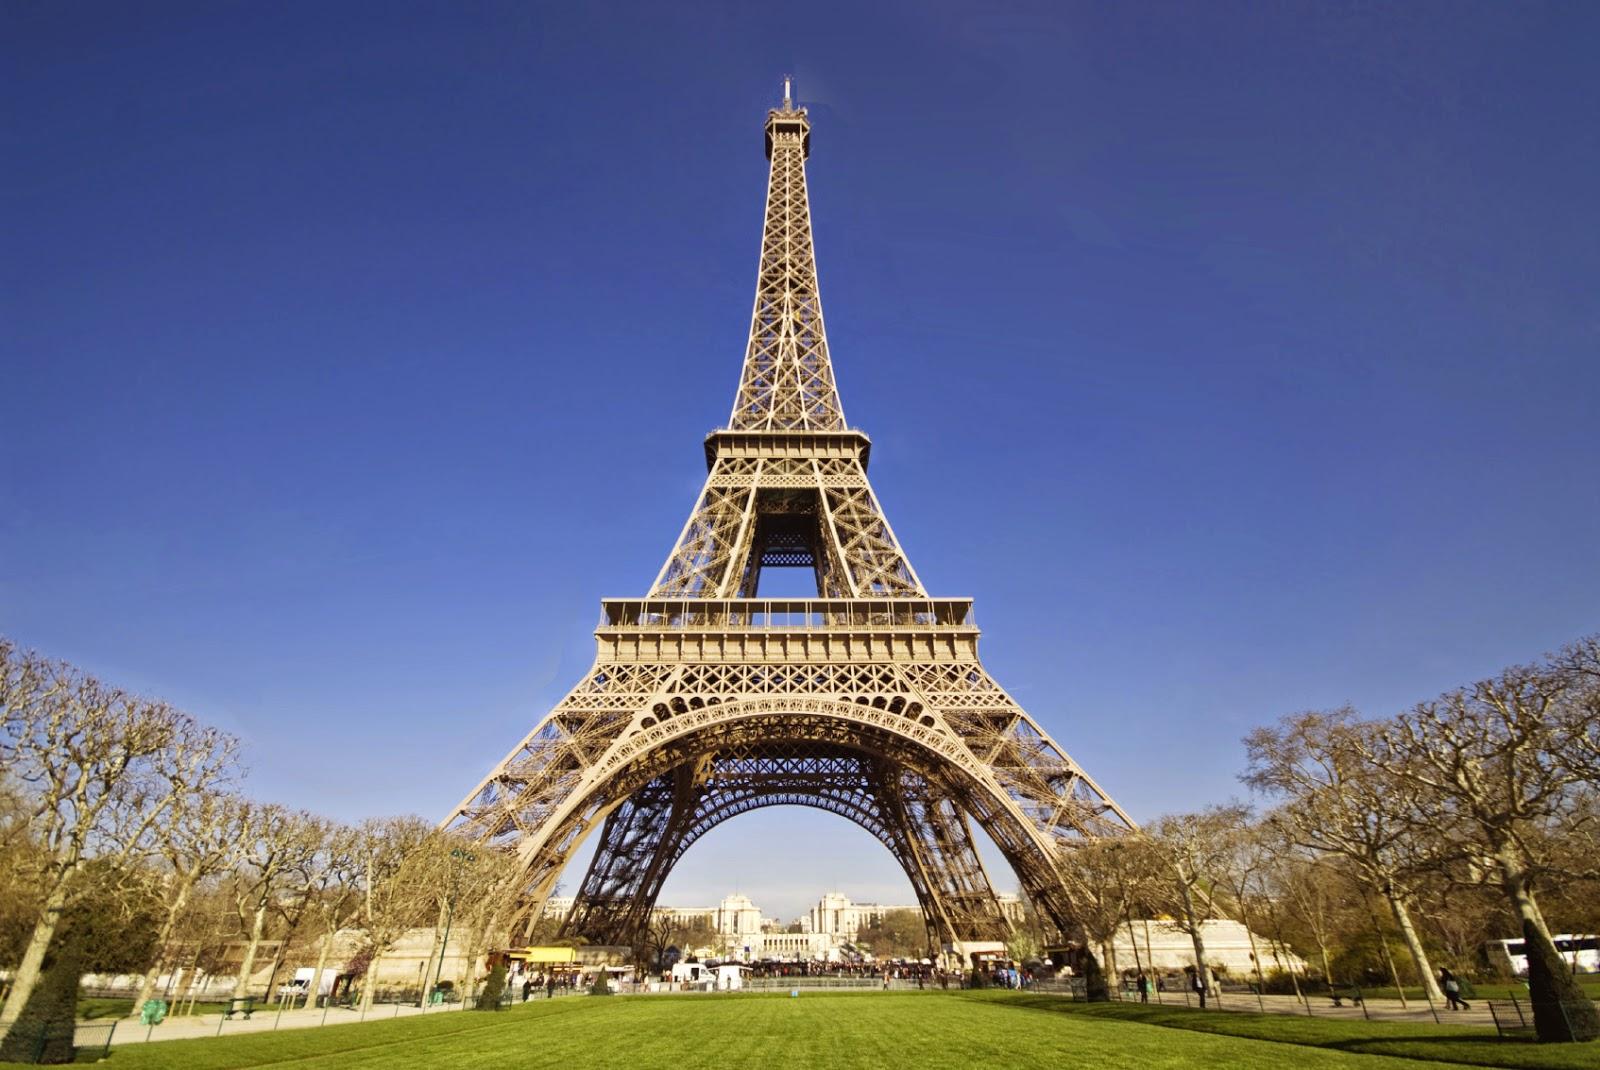 imagenes de la torre eiffel